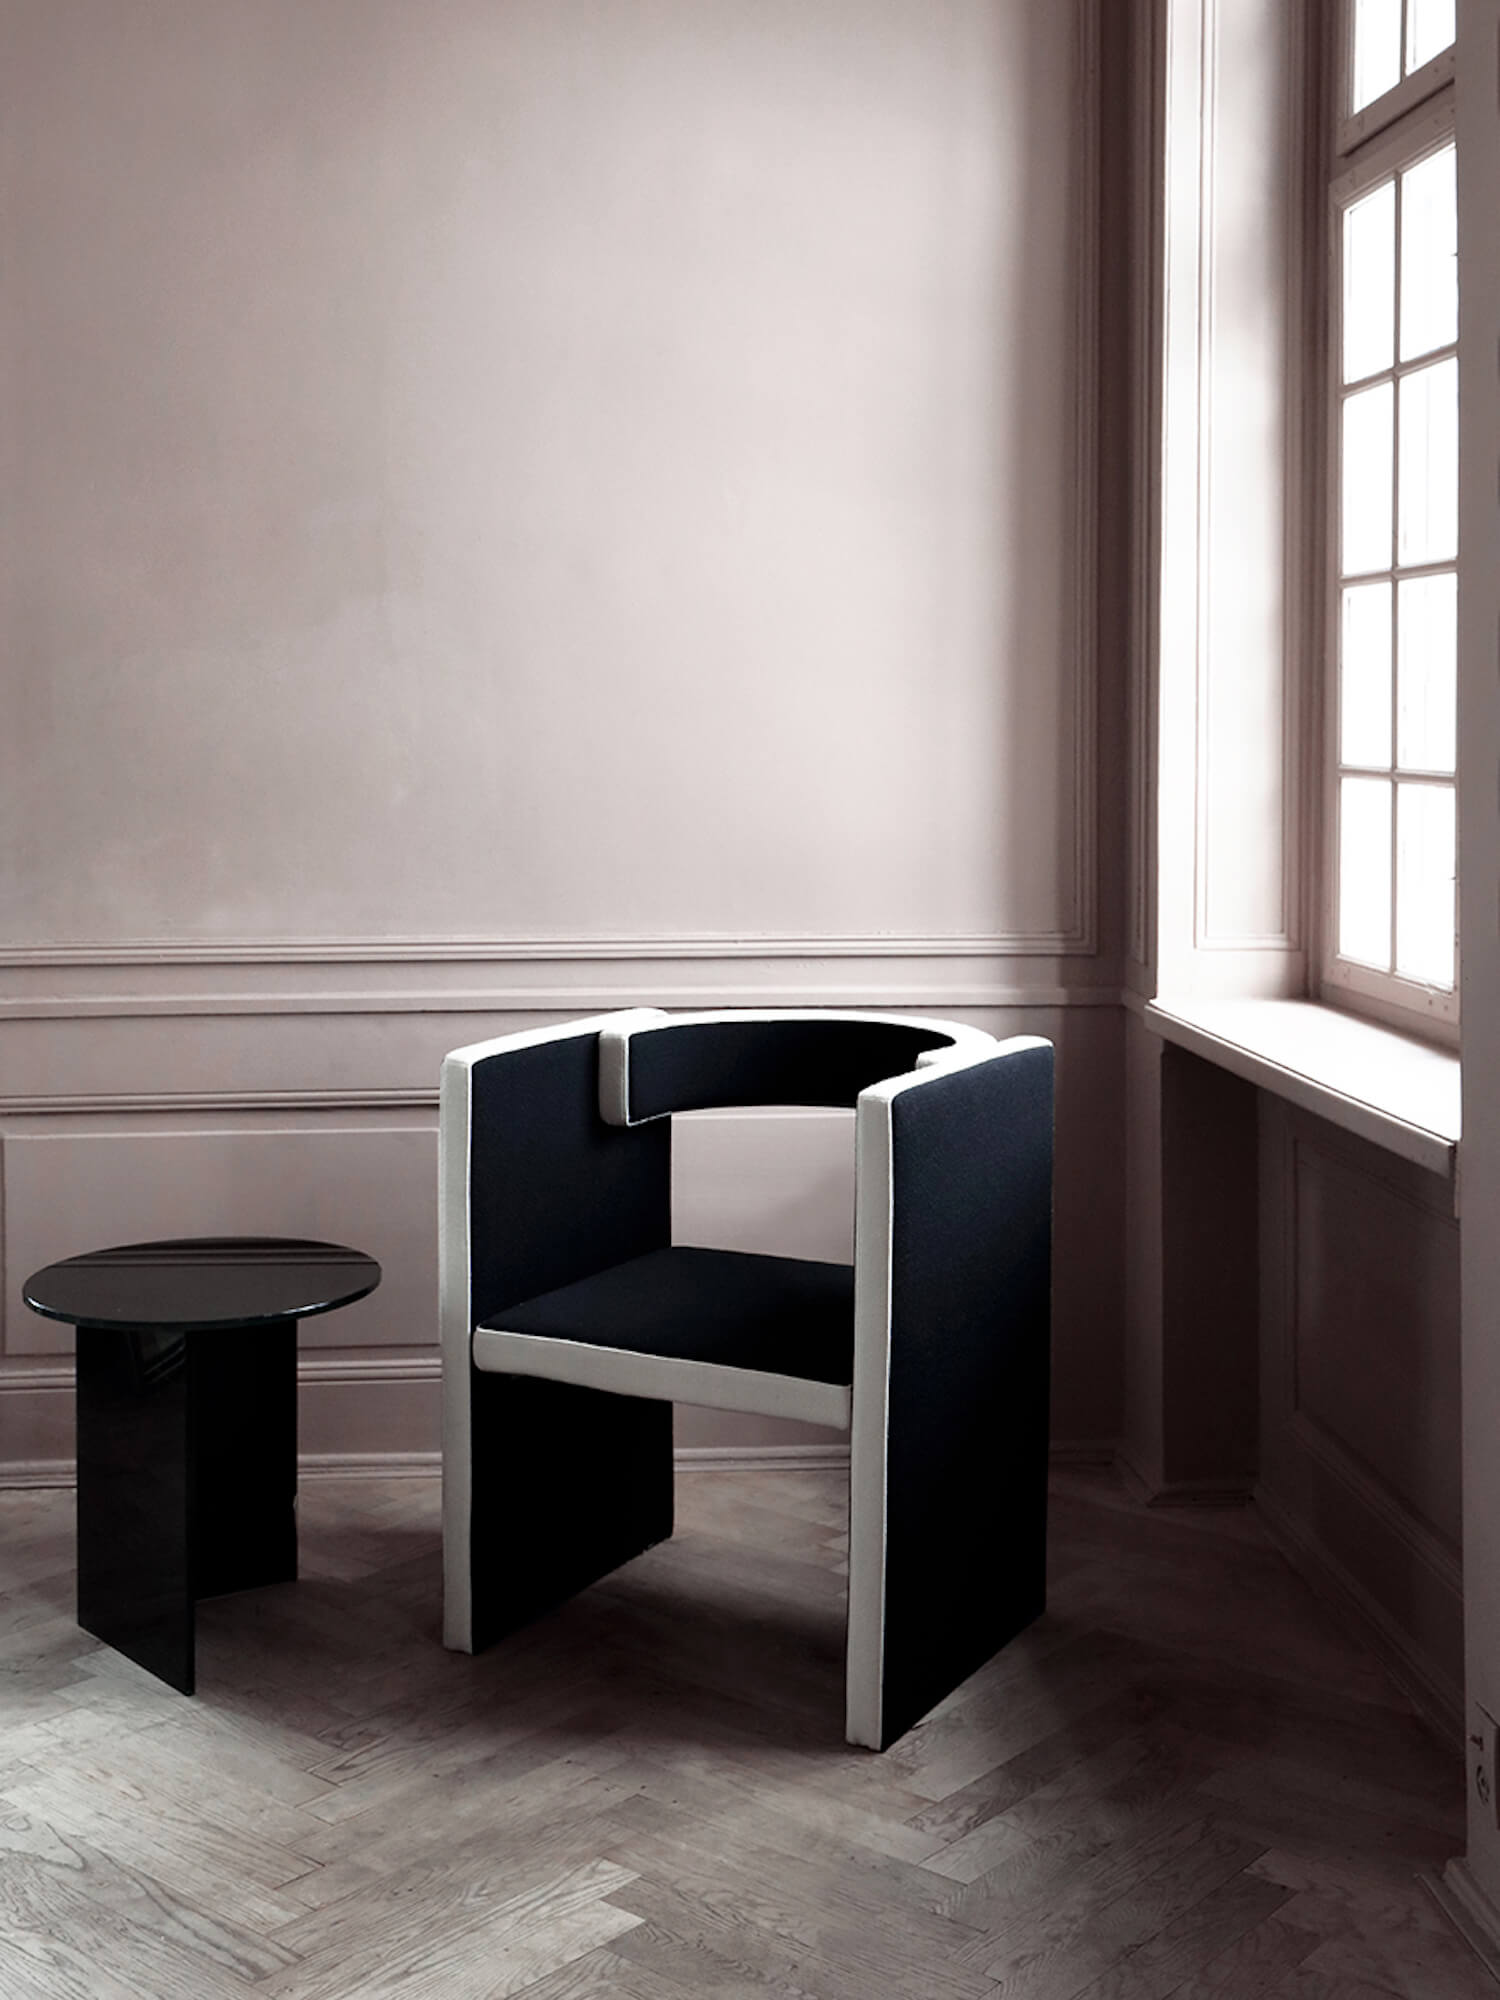 est living stockholm furniture fair friend and founders novel chair 1